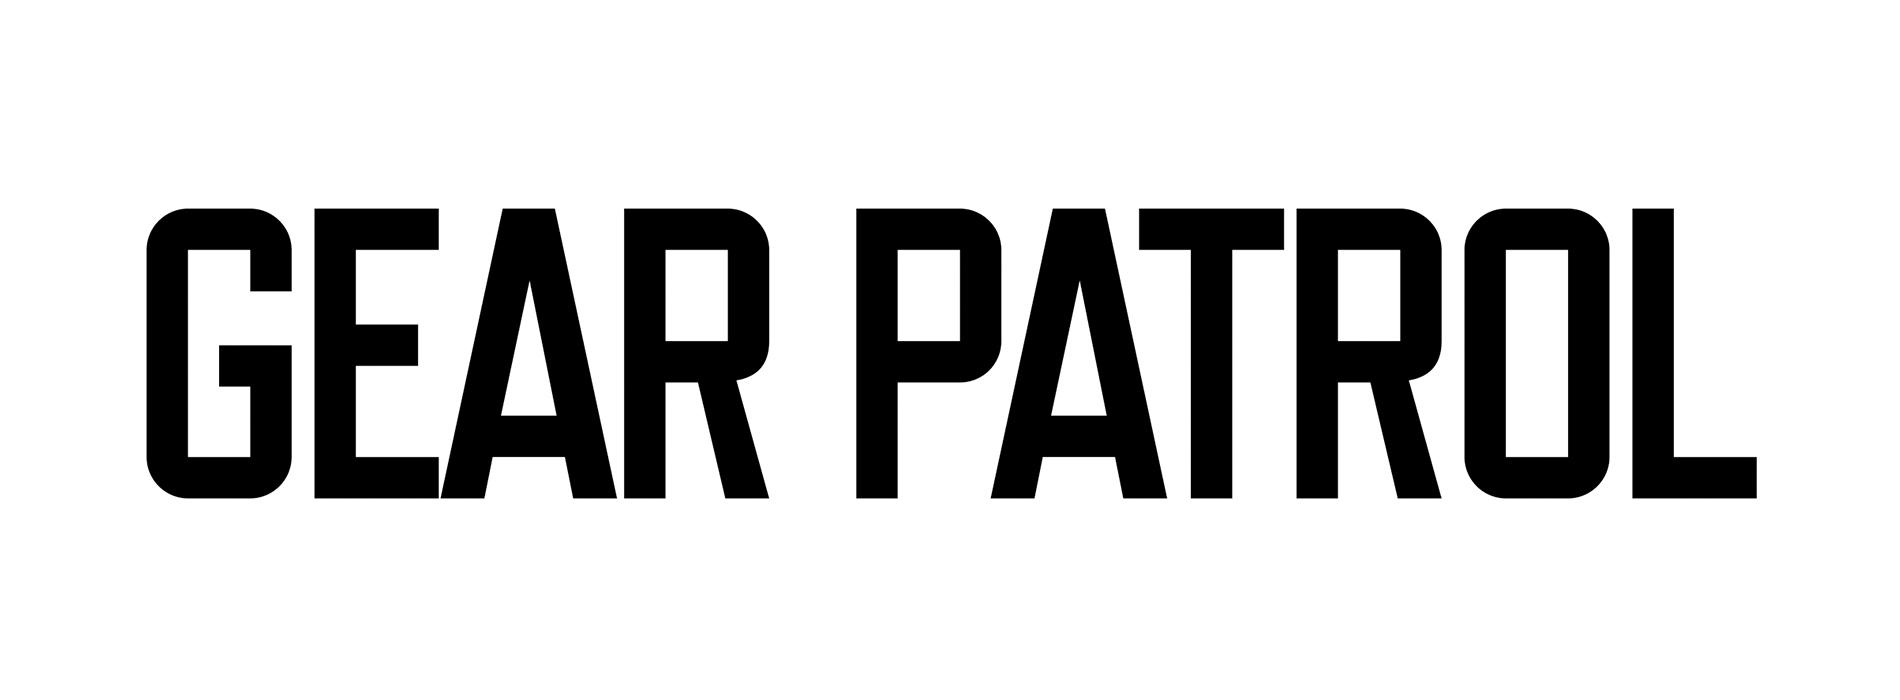 gear patrol.jpg